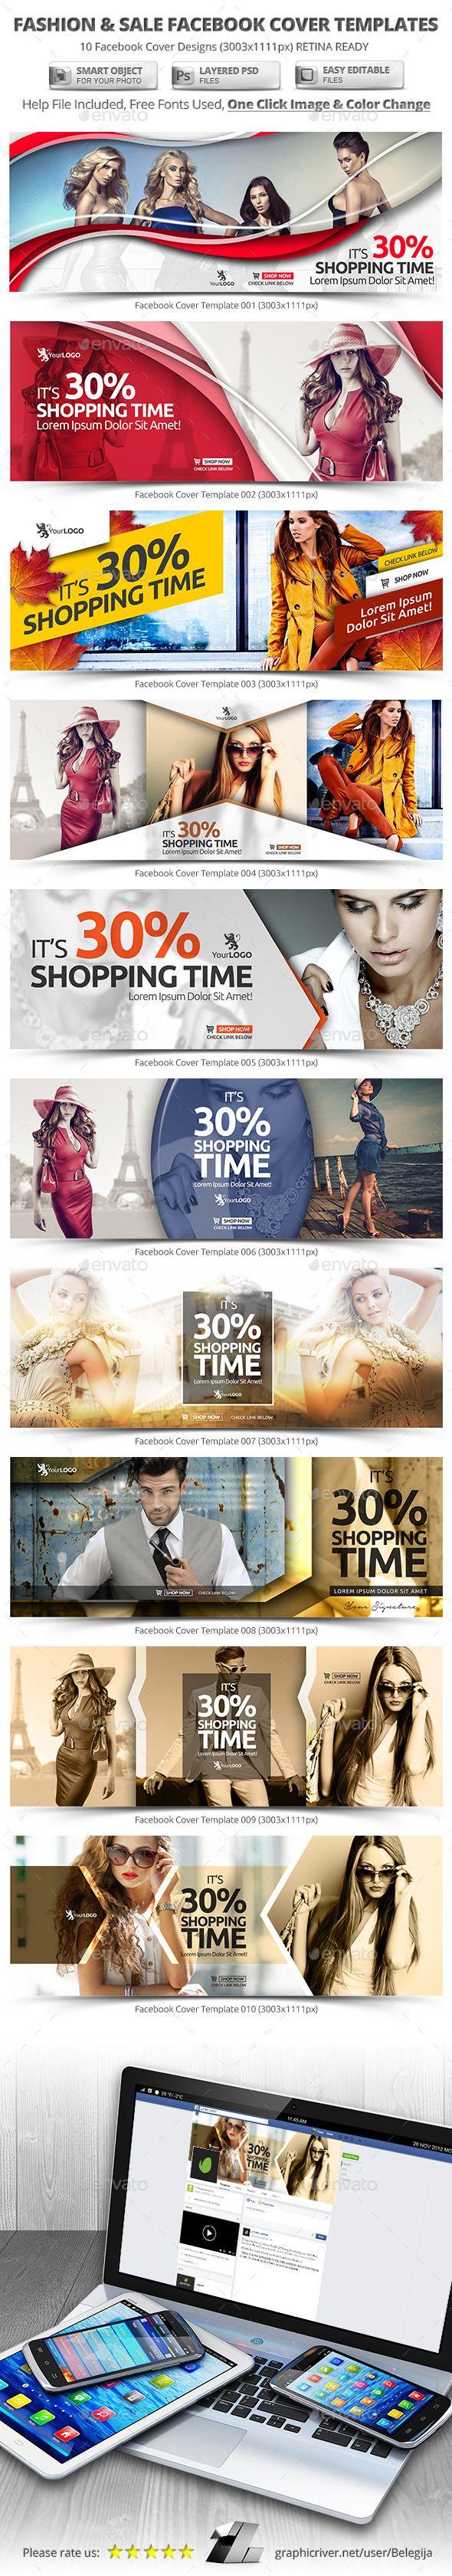 10 Fashion & Sale Facebook Cover Templates #design Download: http://graphicriver.net/item/10-fashion-sale-facebook-cover-templates/12642017?ref=ksioks